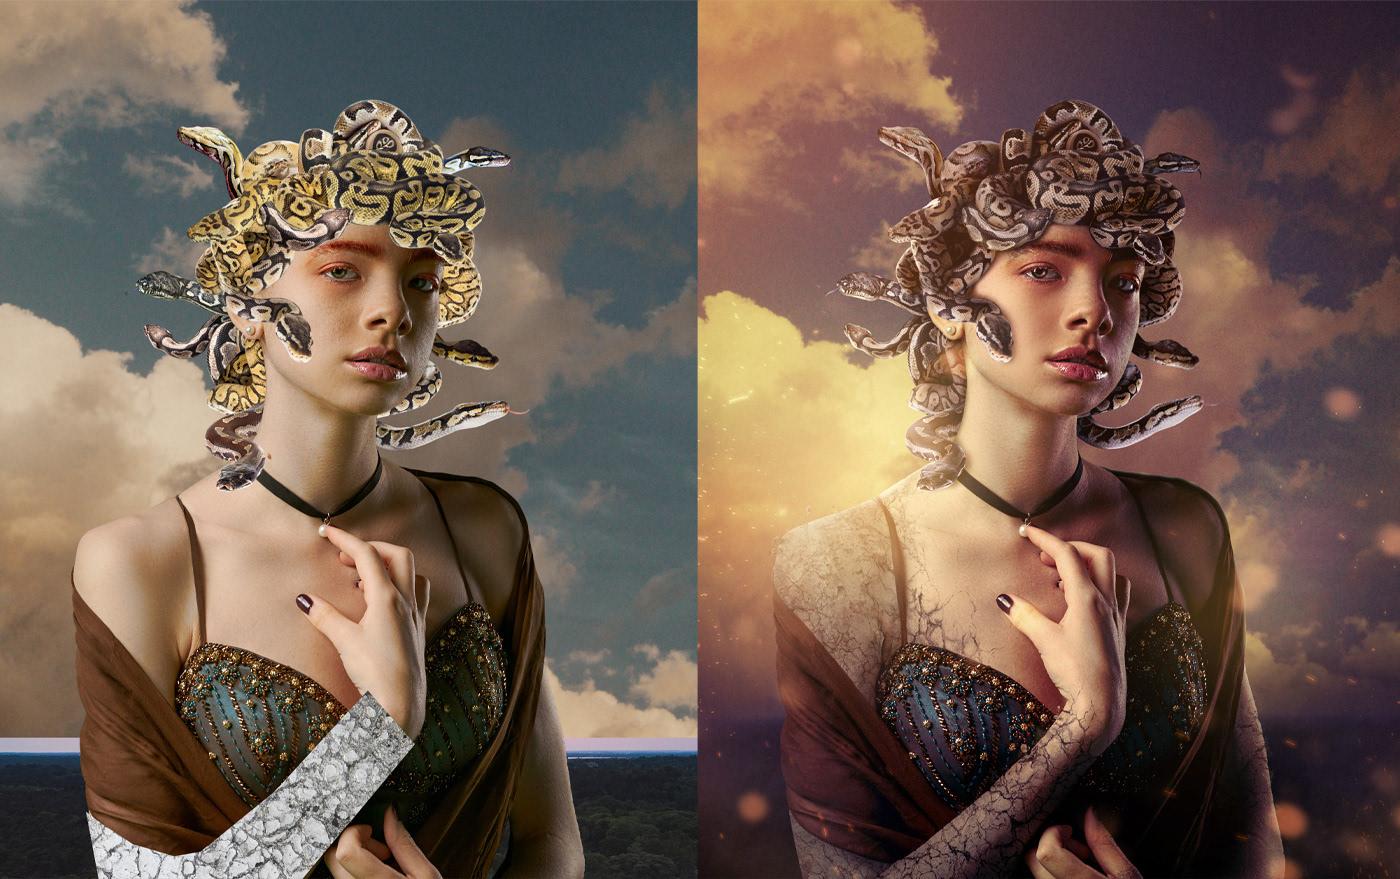 bashing,compositing,Creative Retouching,Matte Painting,Photo Manipulation ,photoshop,medusa,retoucher,Digital Art